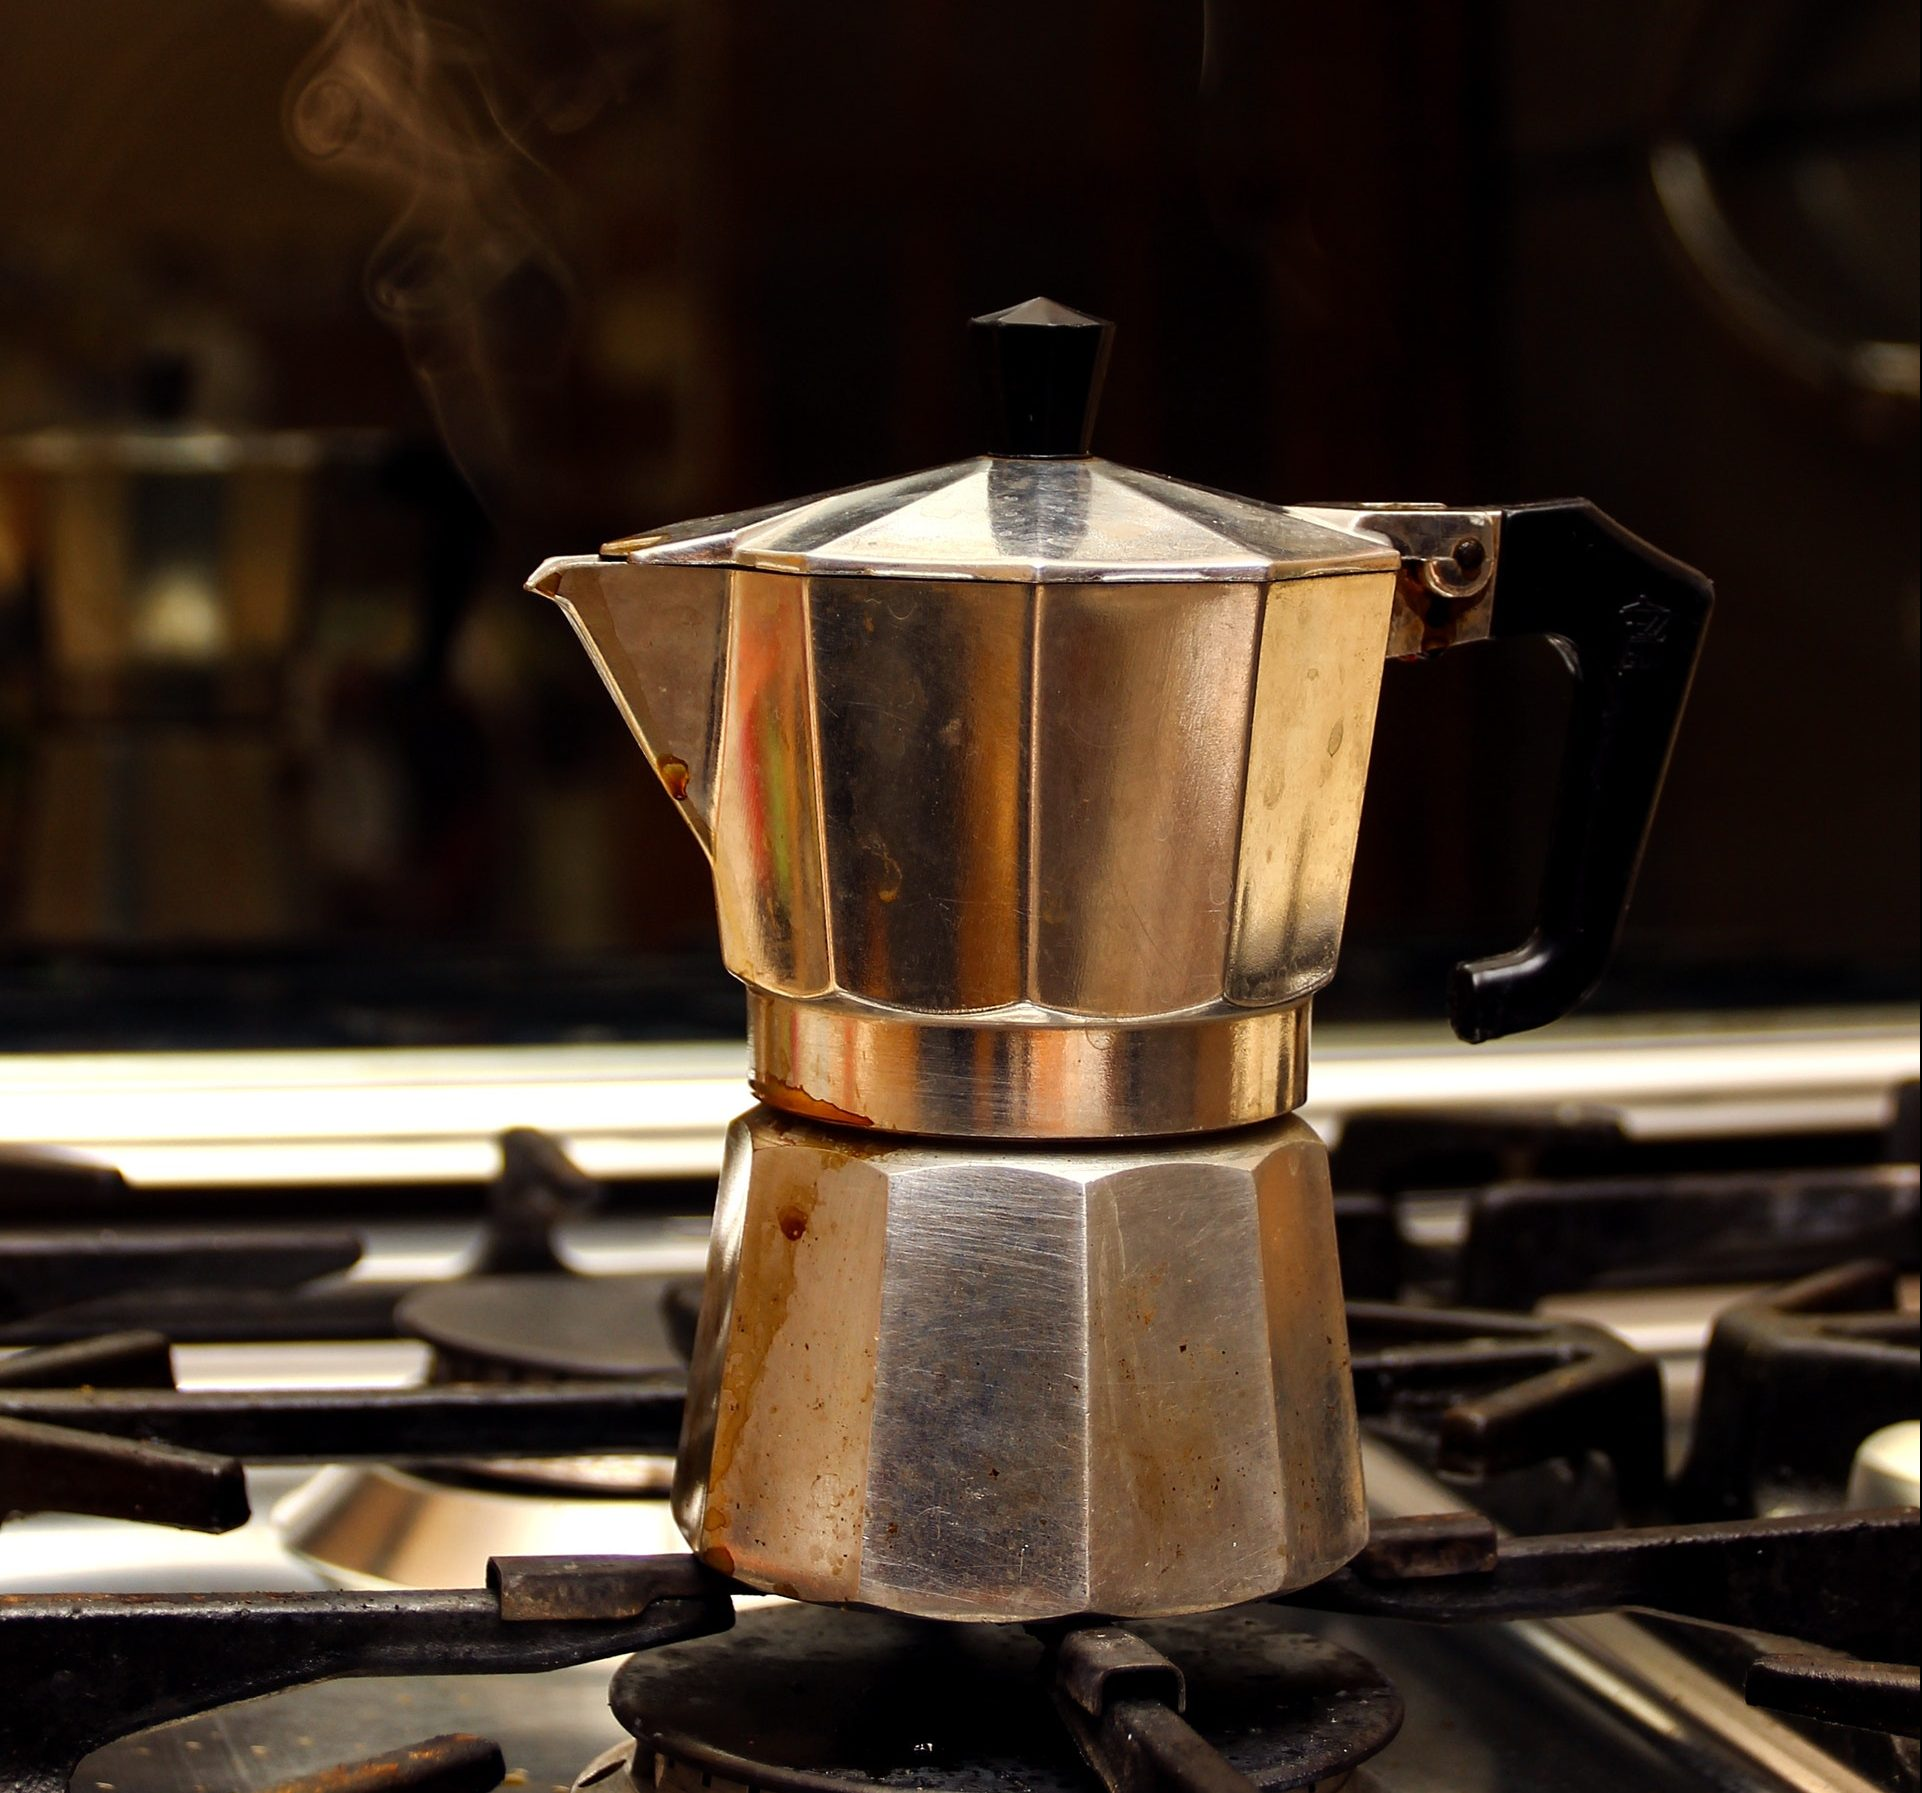 blur-close-up-coffee-maker-714563